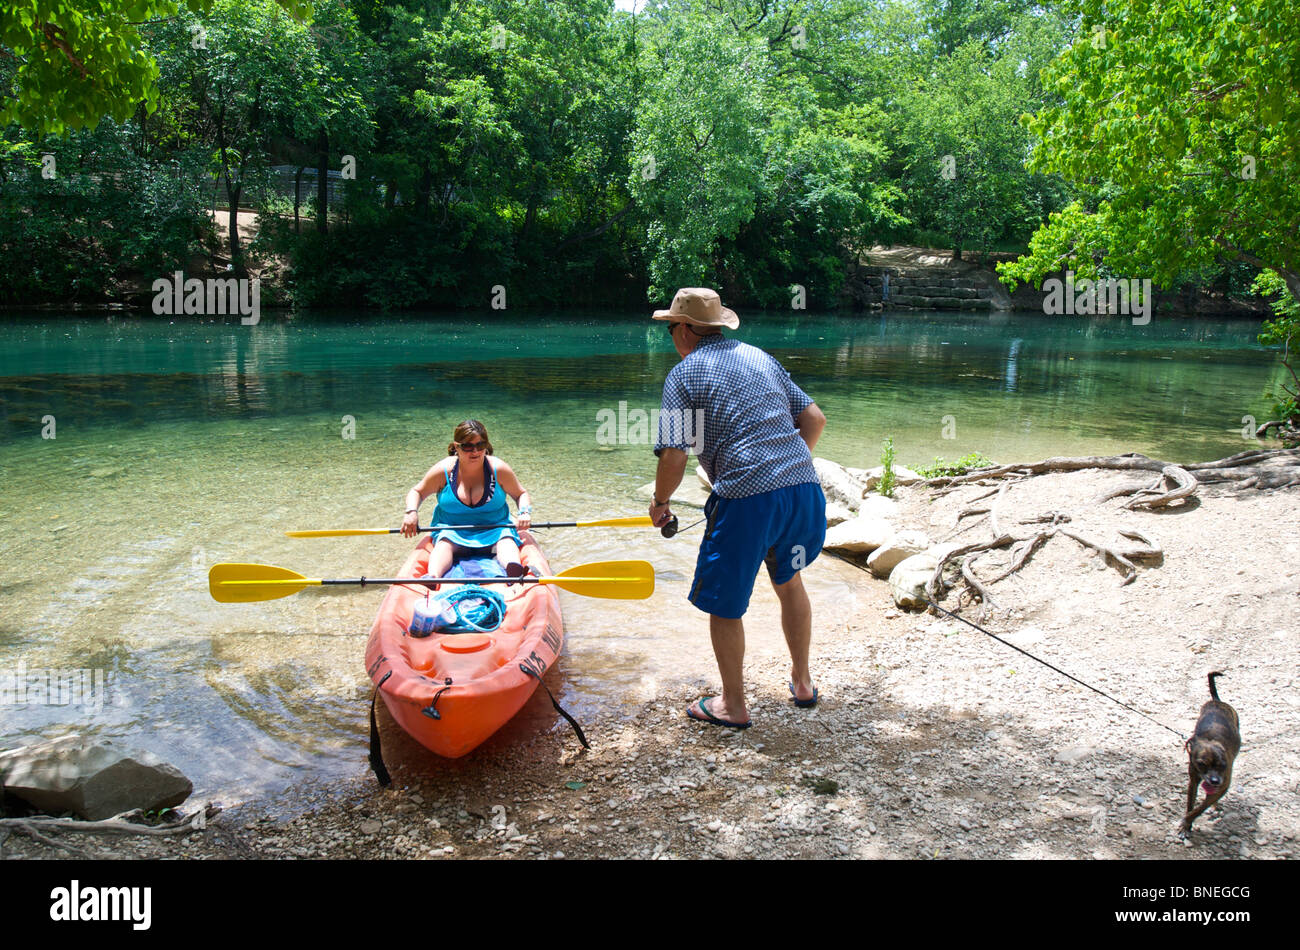 Couple rented canoe on Colorado River in Zilker Park, Austin, Texas, USA - Stock Image